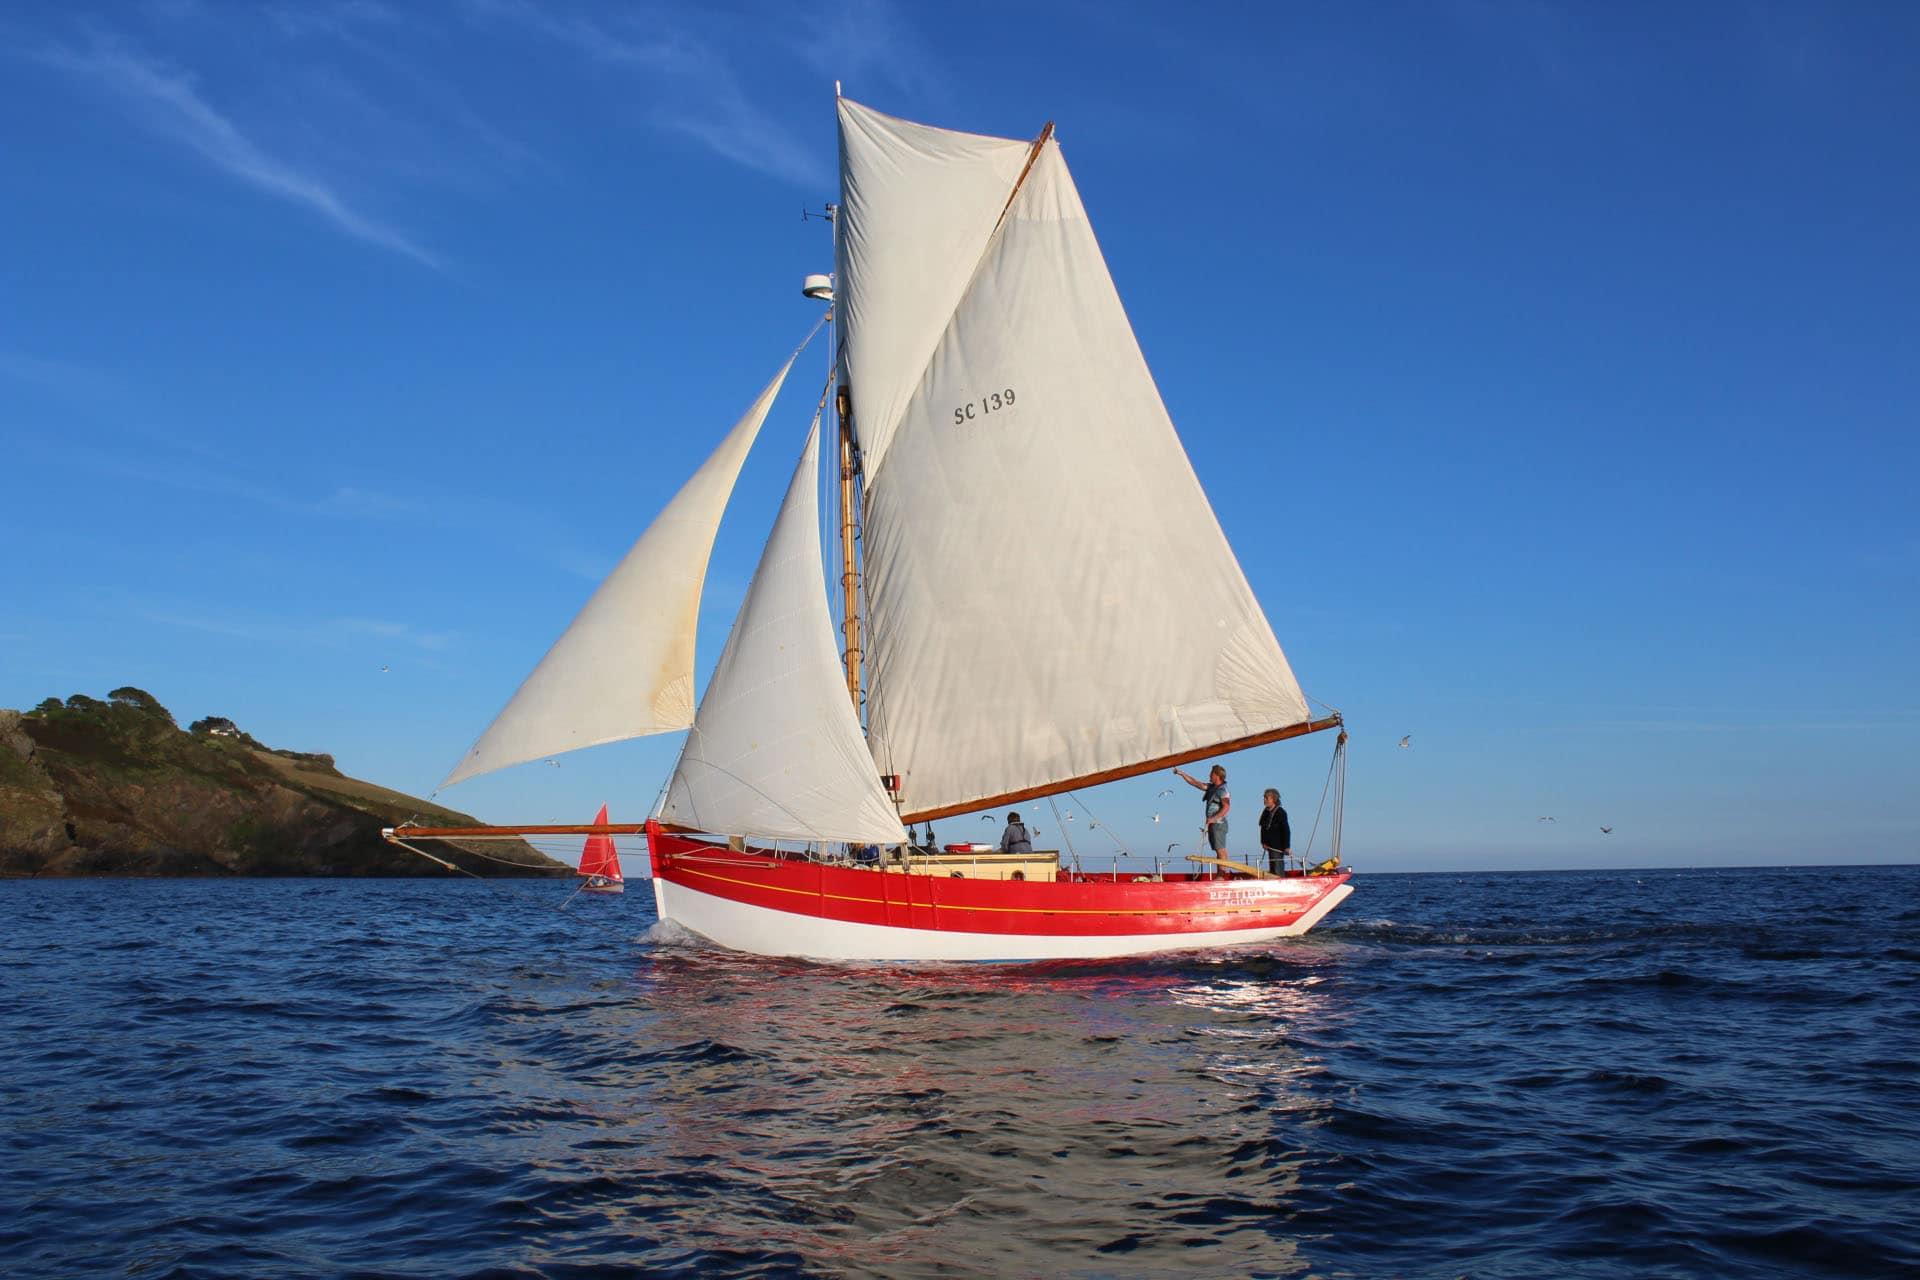 Pettifox under sail